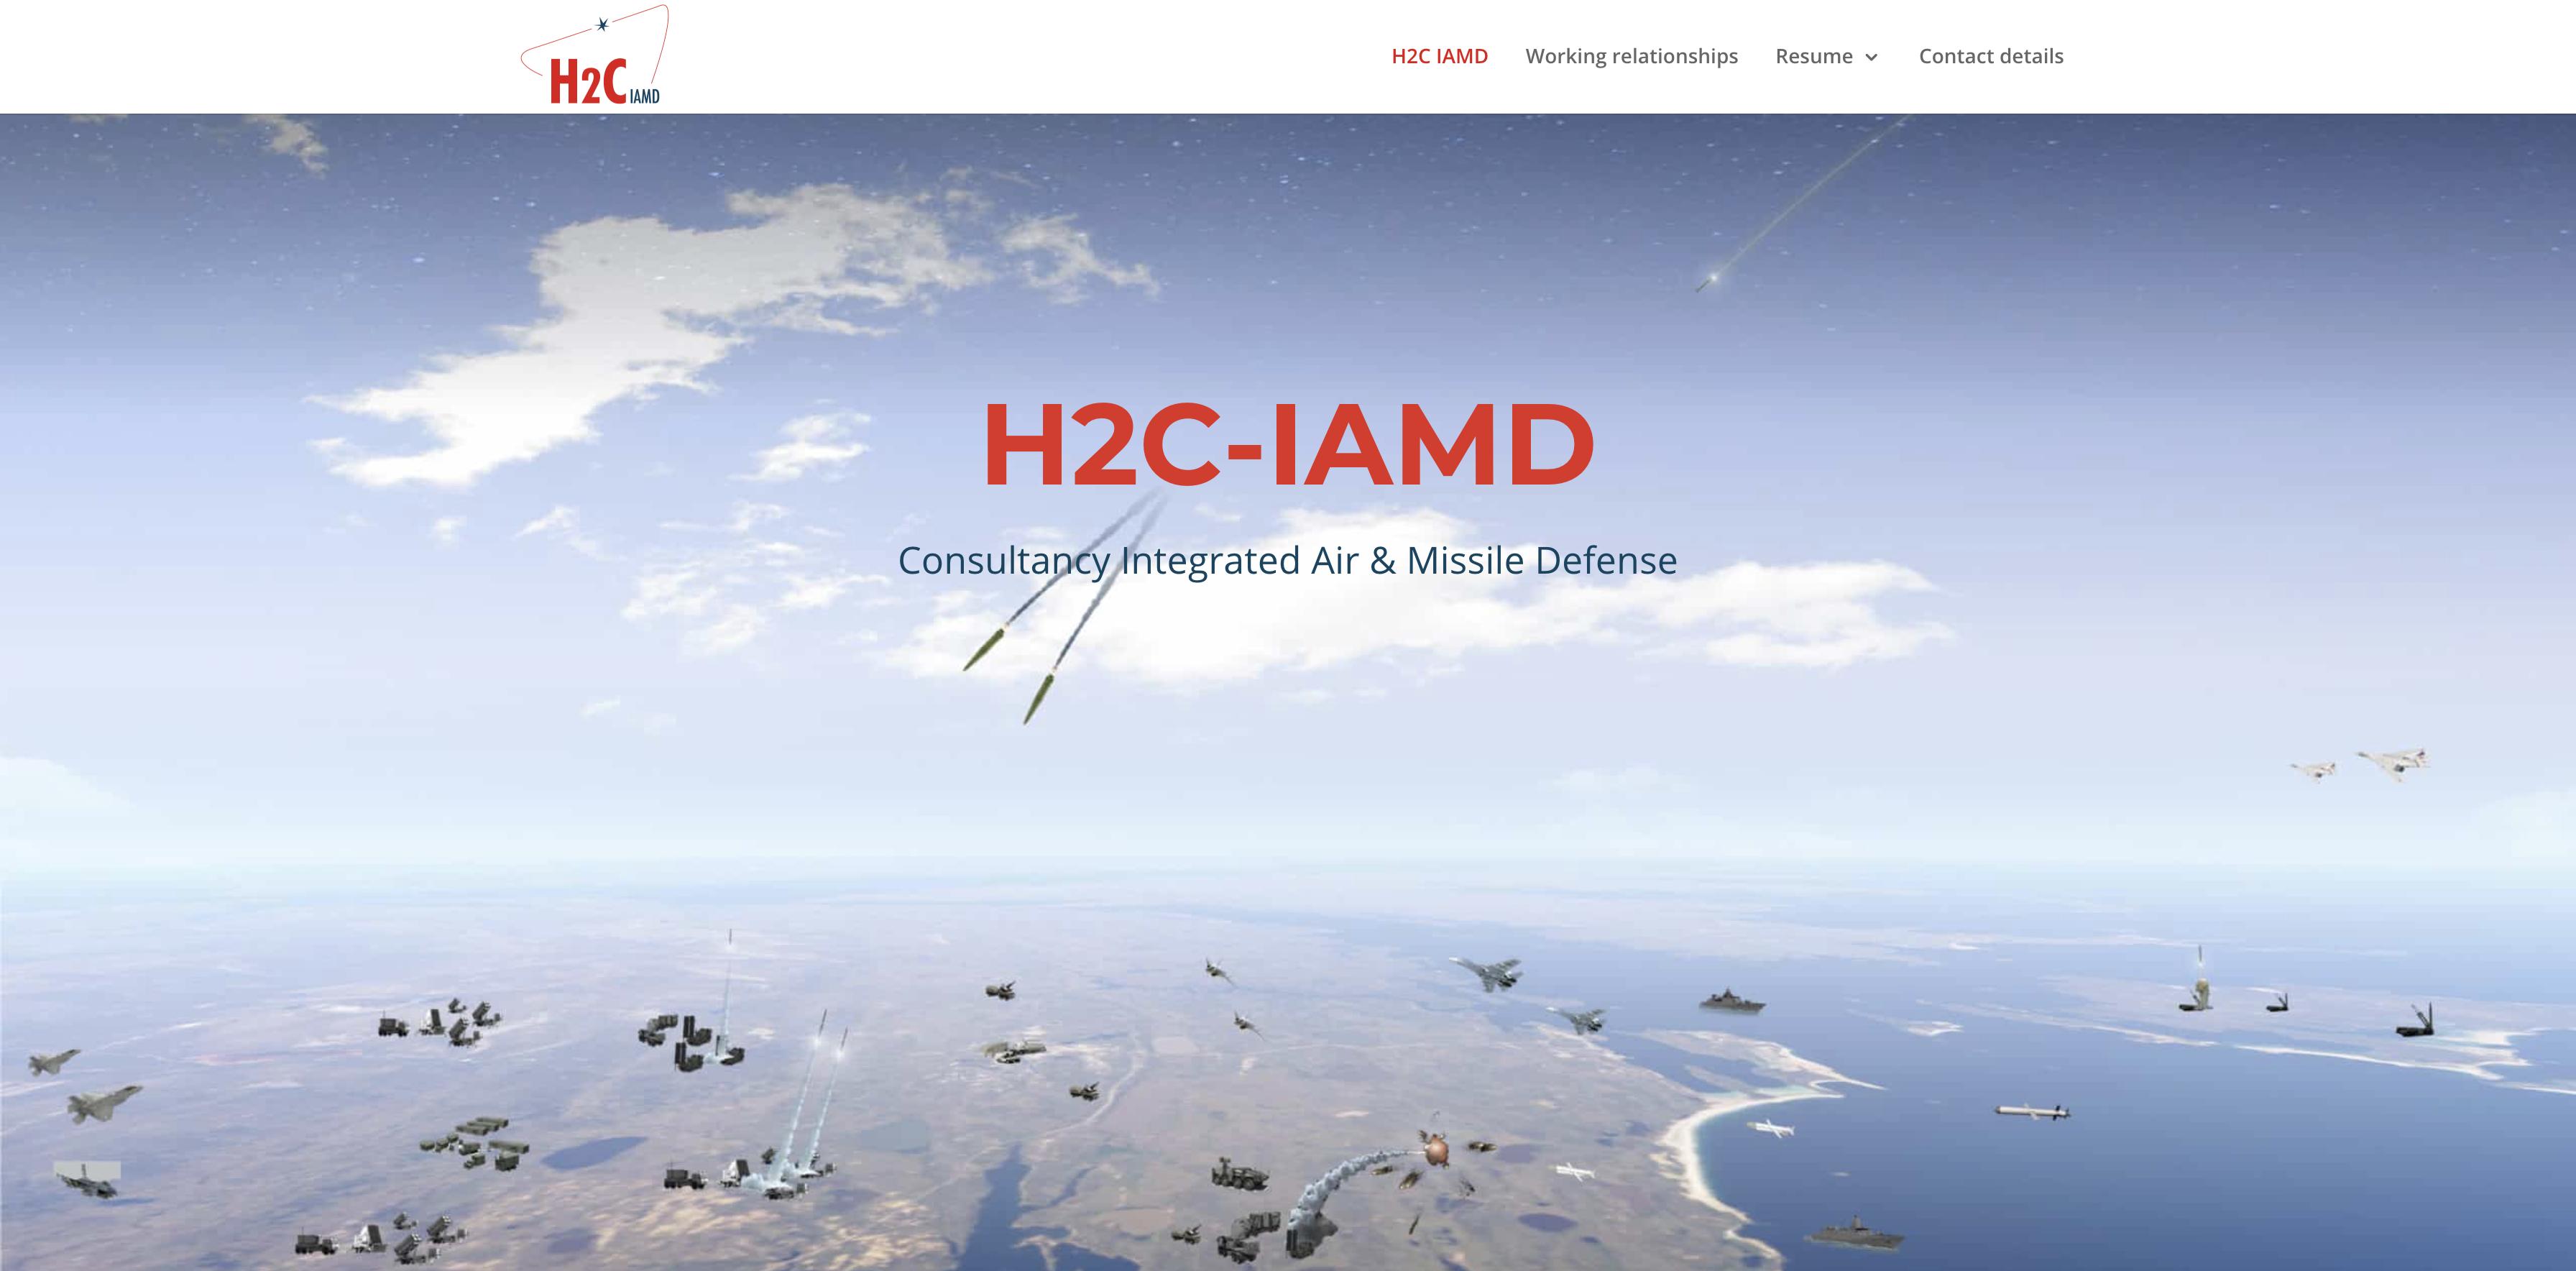 H2C-iamd